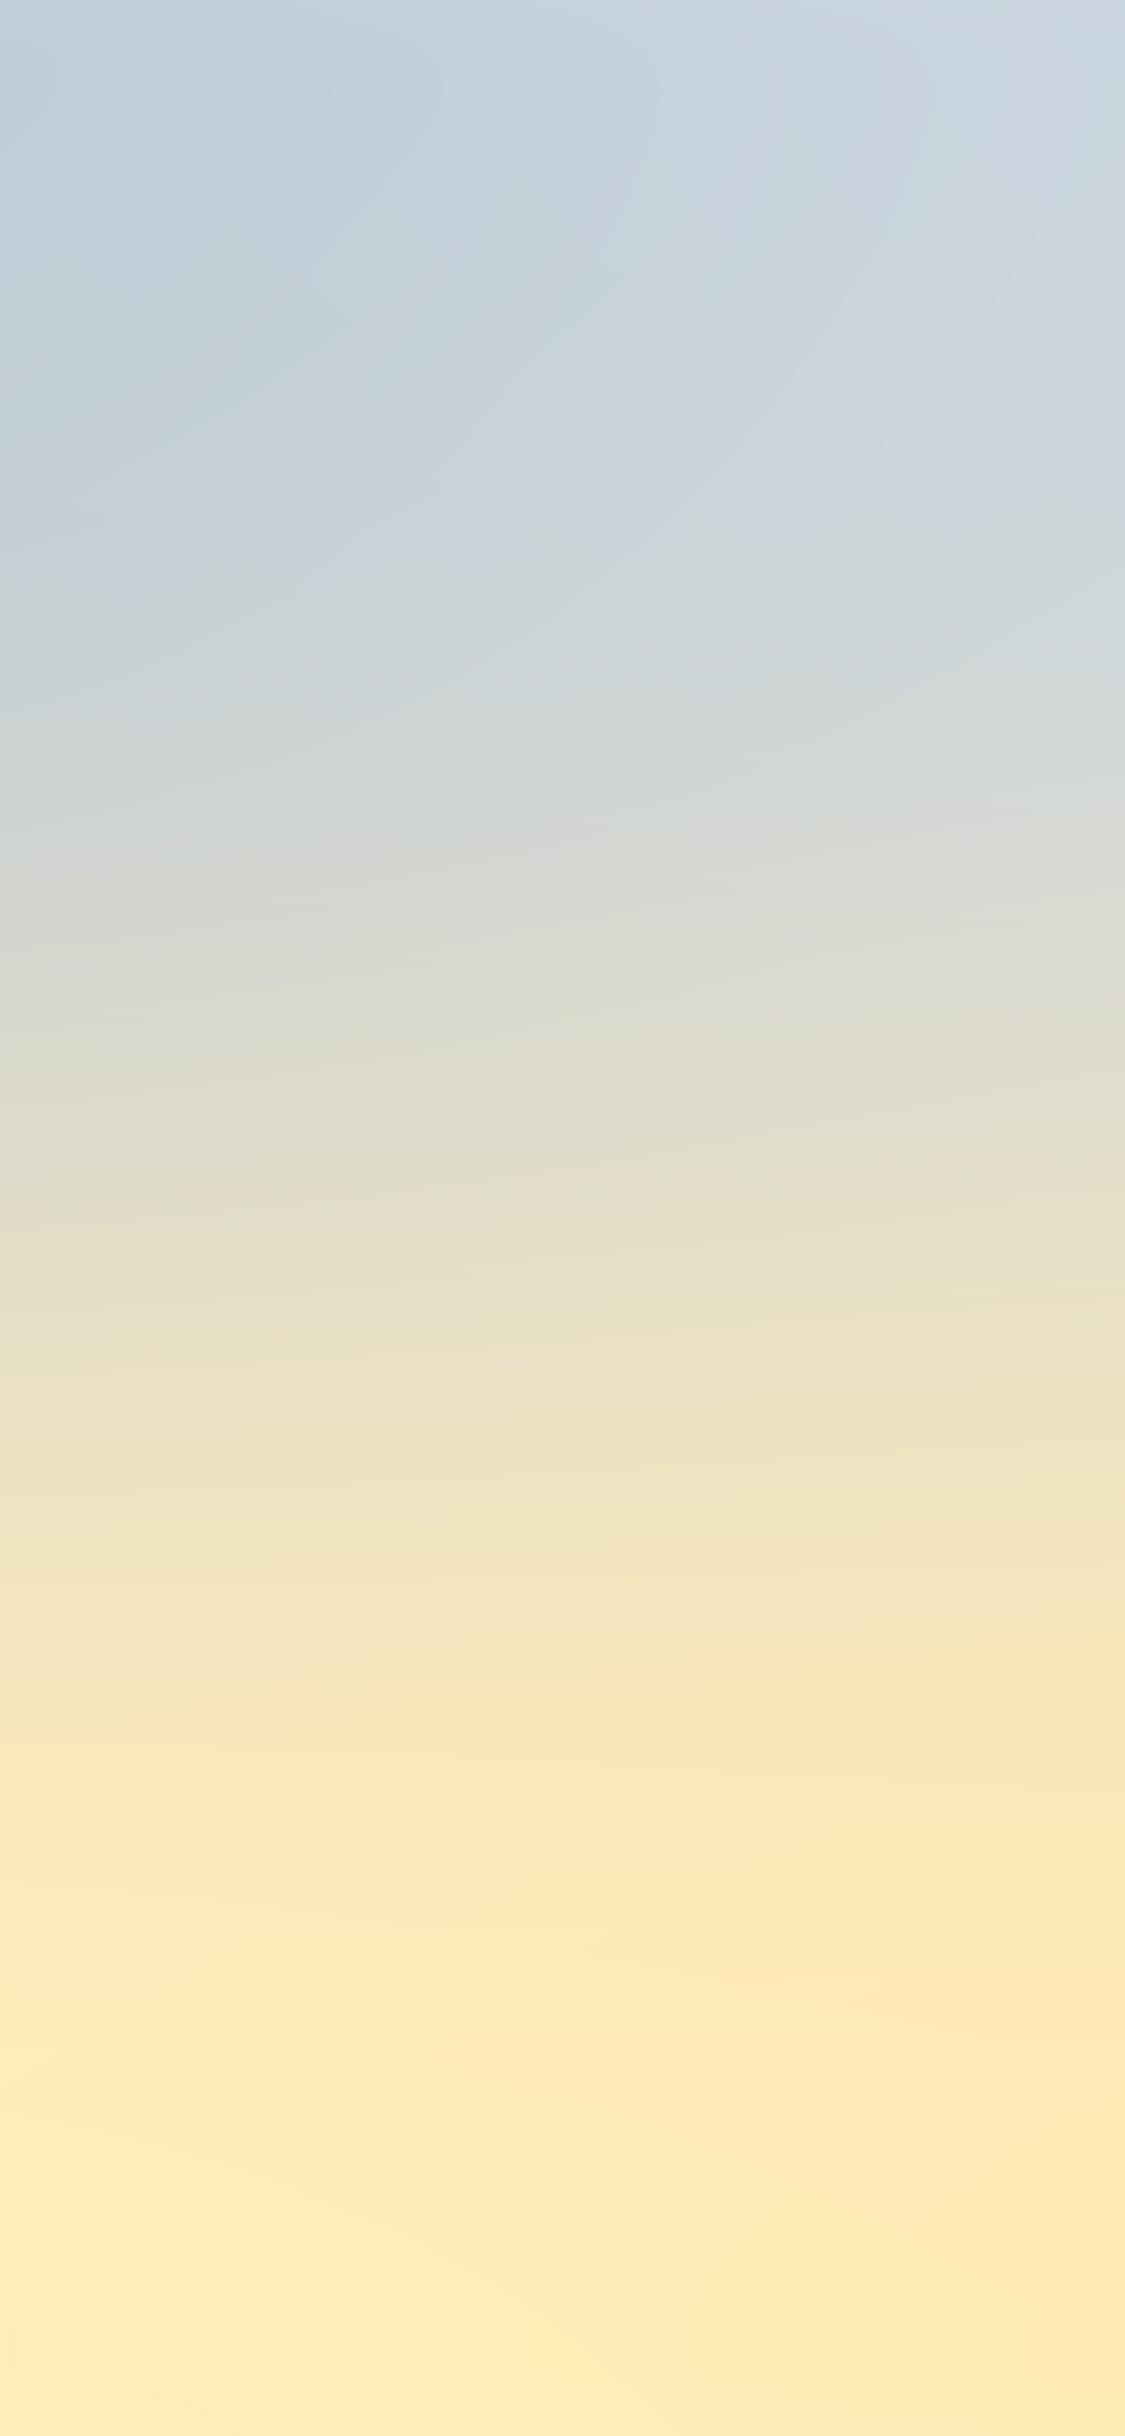 iPhonexpapers.com-Apple-iPhone-wallpaper-sn06-land-blur-gradation